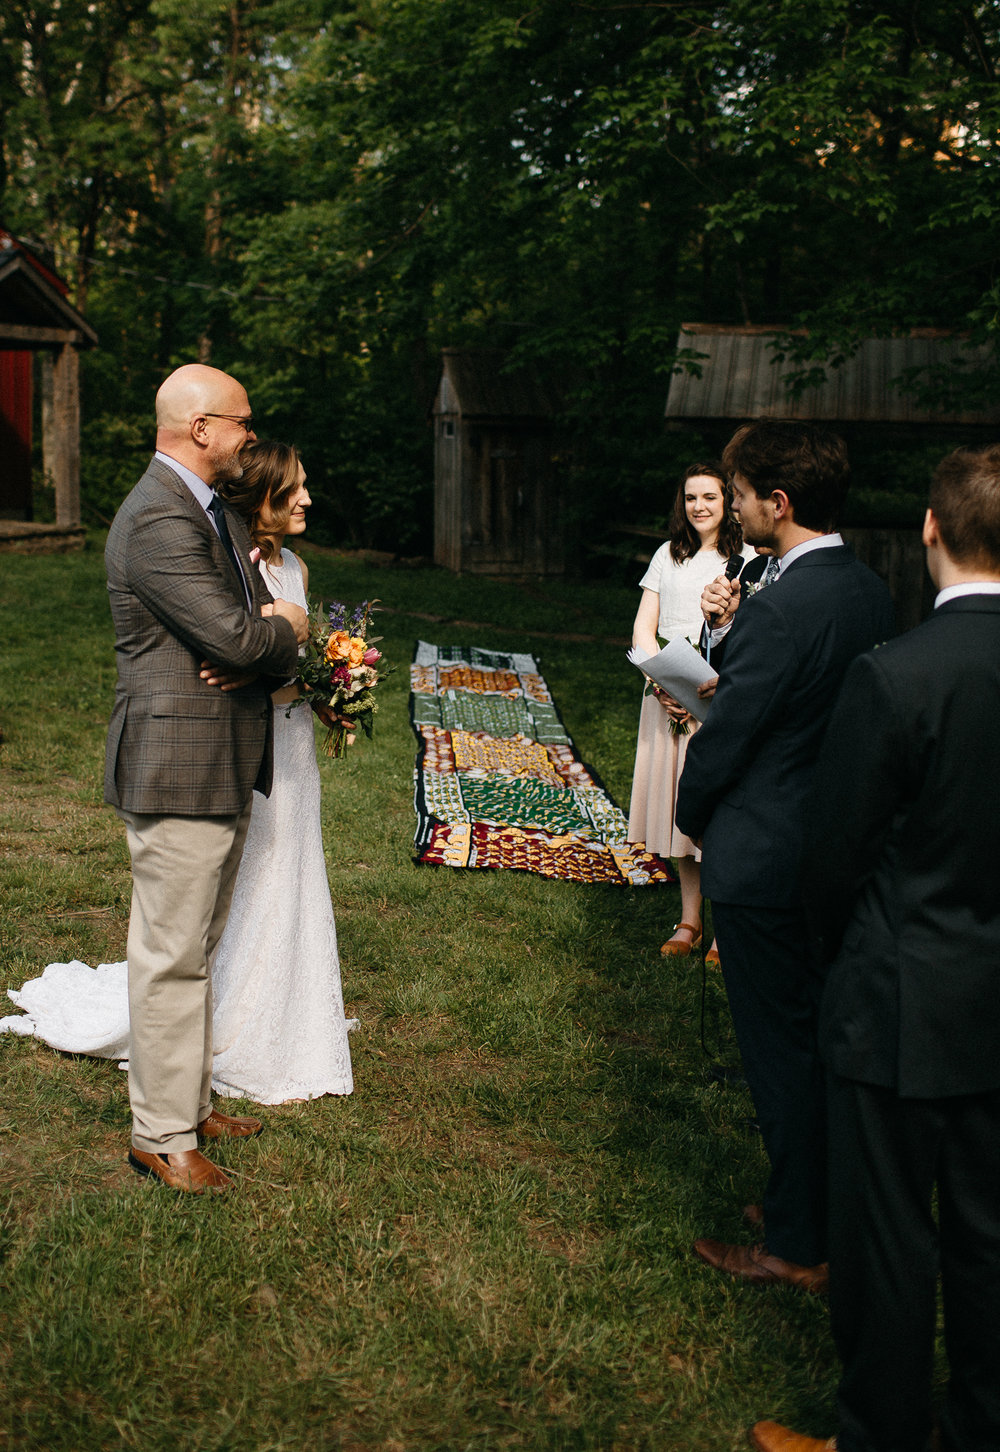 eastlyn bright intimate ohio backyard bohemian forest wedding photographer -54.jpg